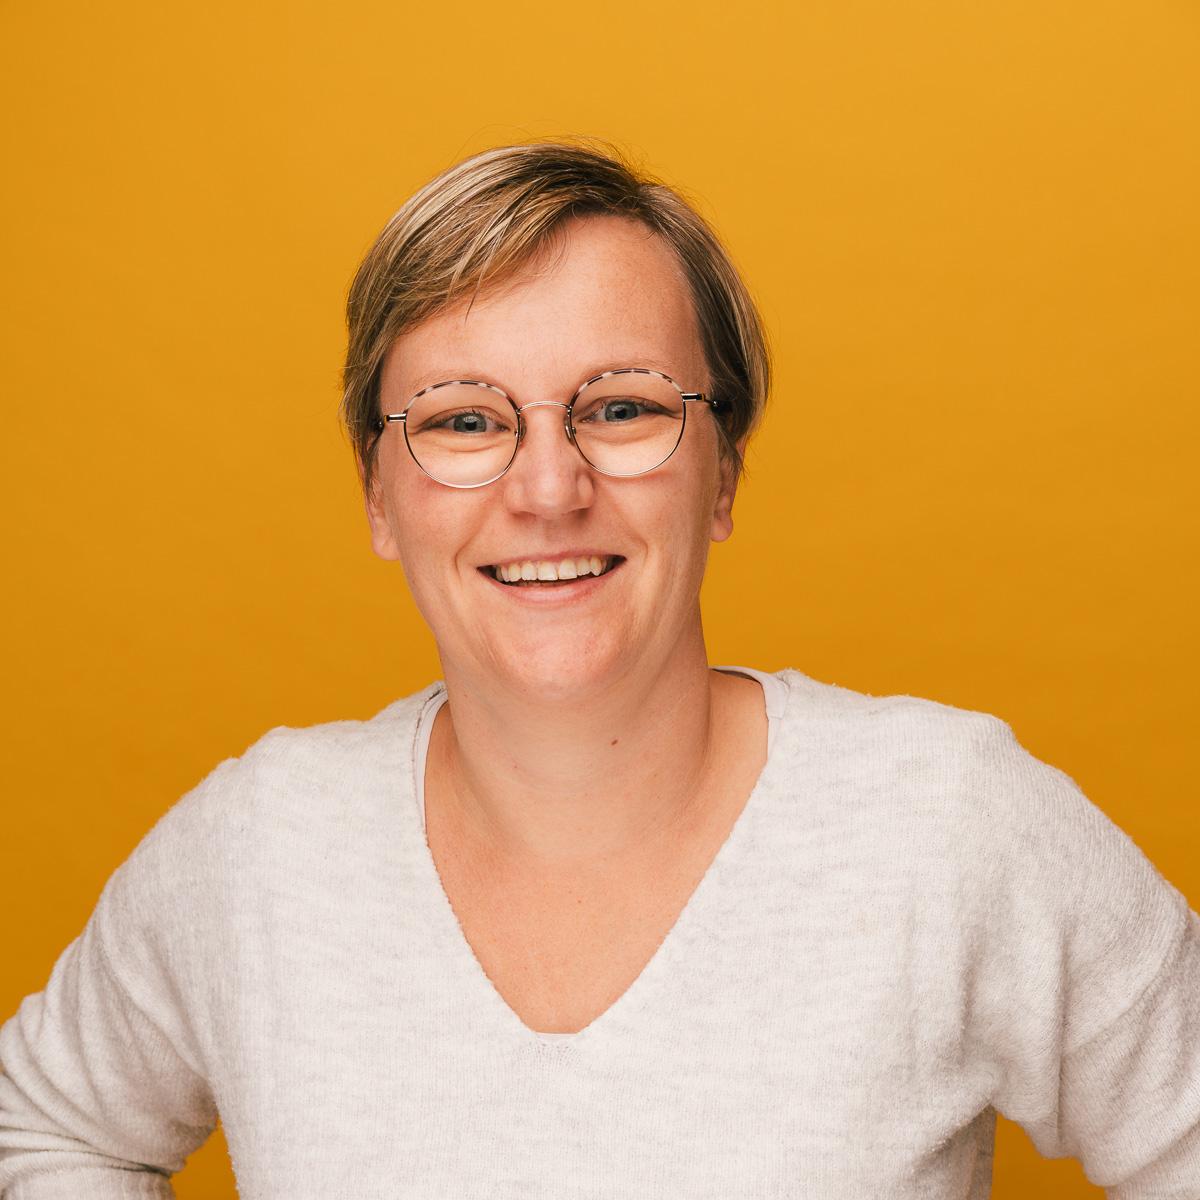 Hanne Buyckx